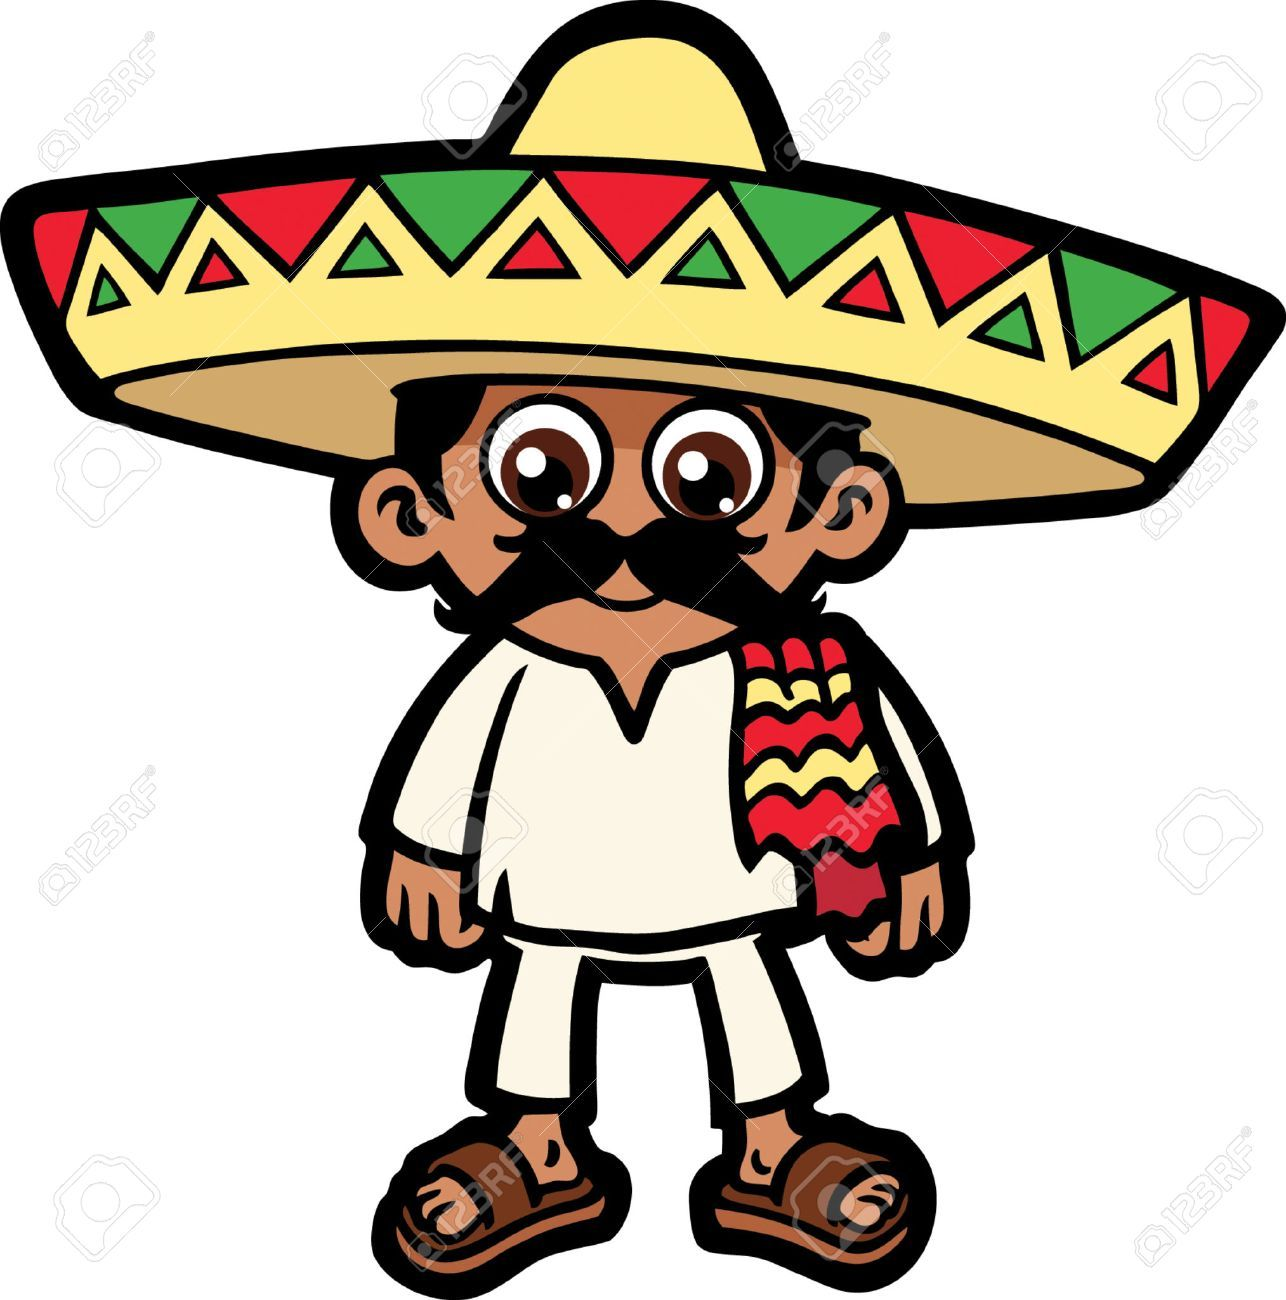 Mexican man with sombrero clipart 8 » Clipart Portal.